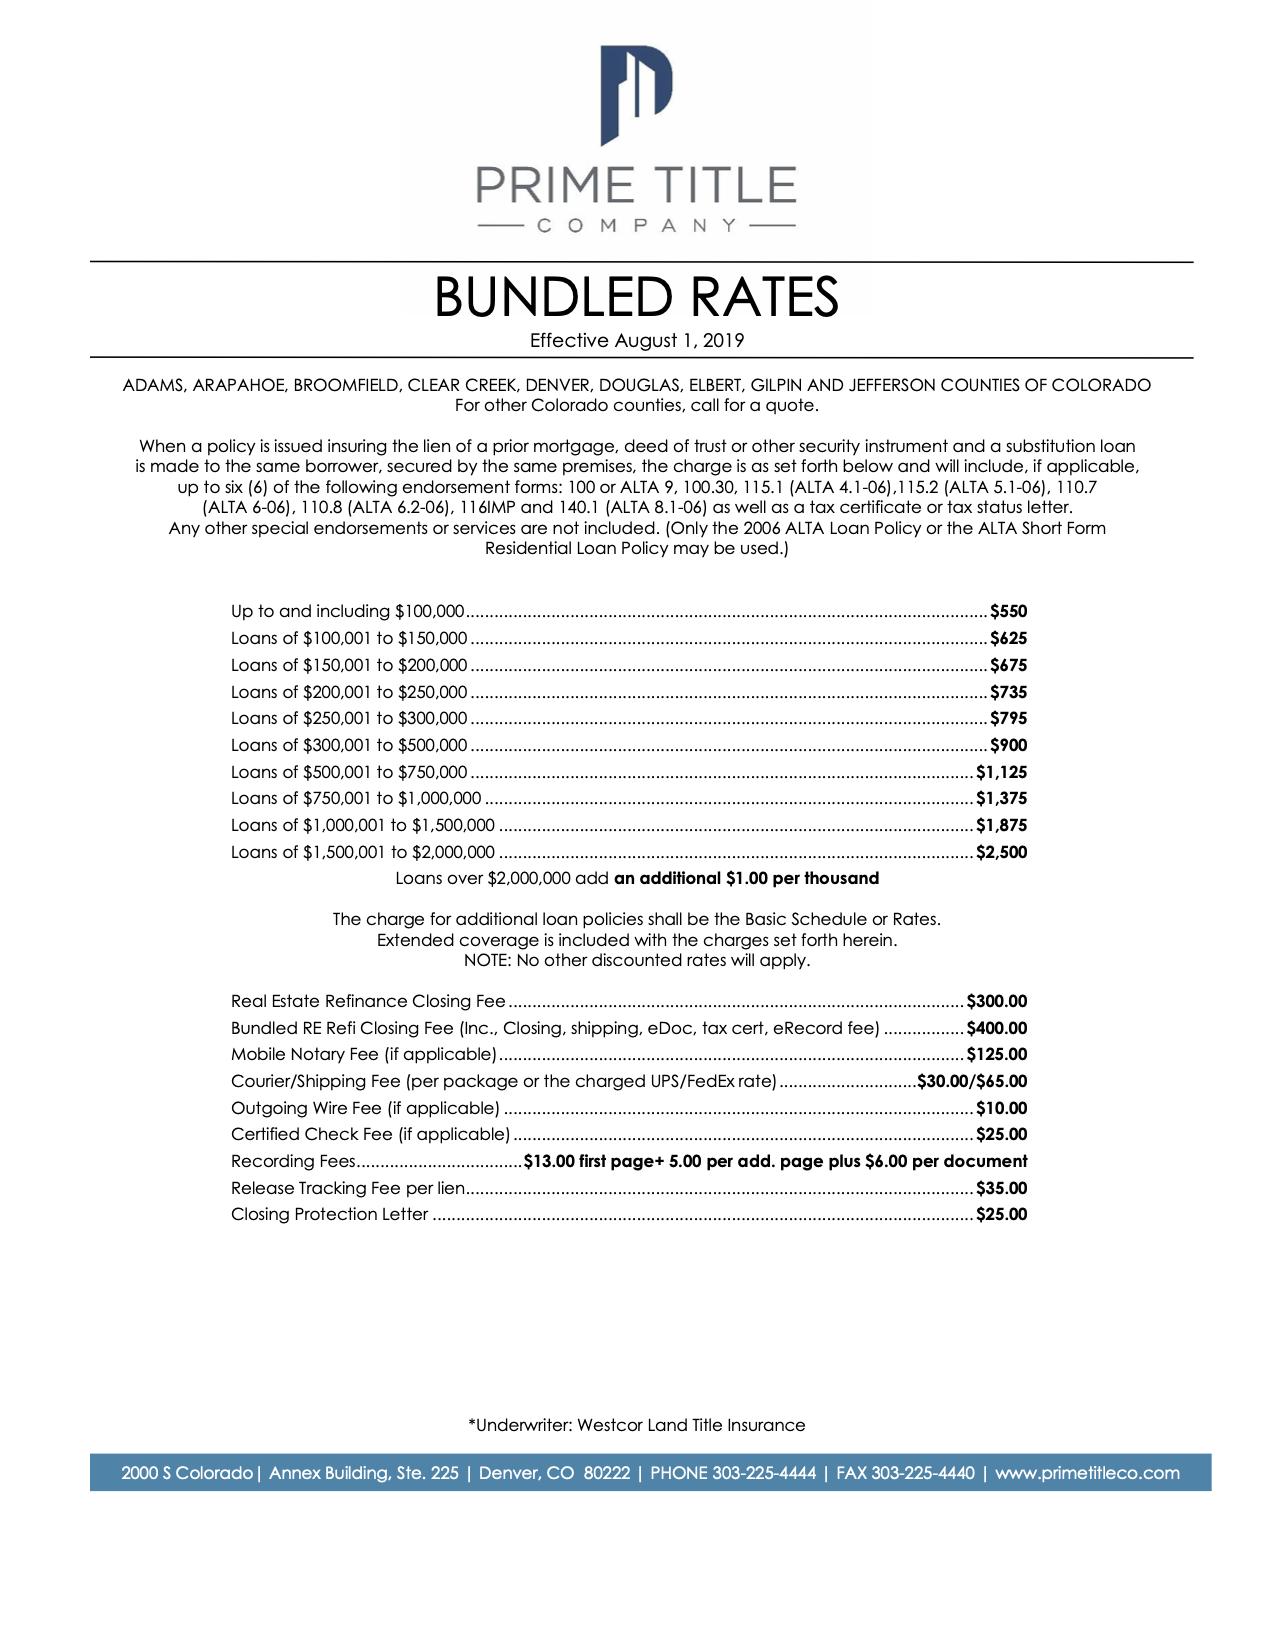 PRIME- CO_BundledRates_08.1.19